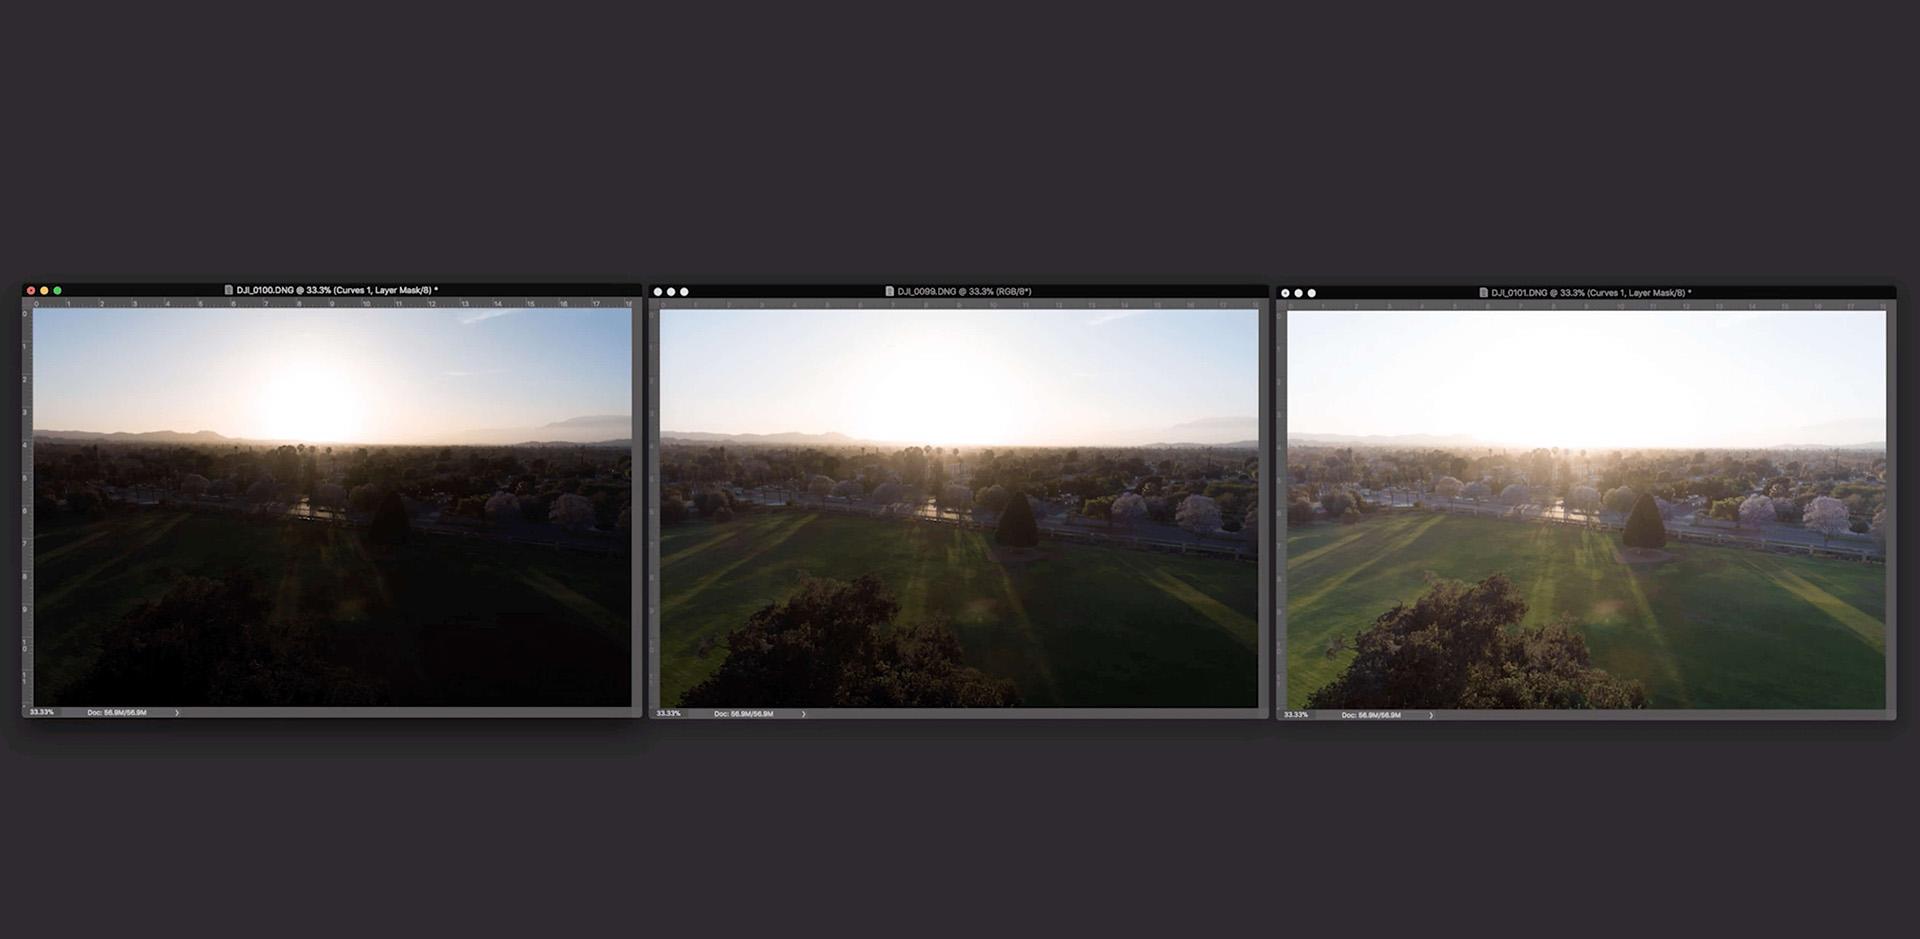 basic camera settings for dji drone photos - AEB 2